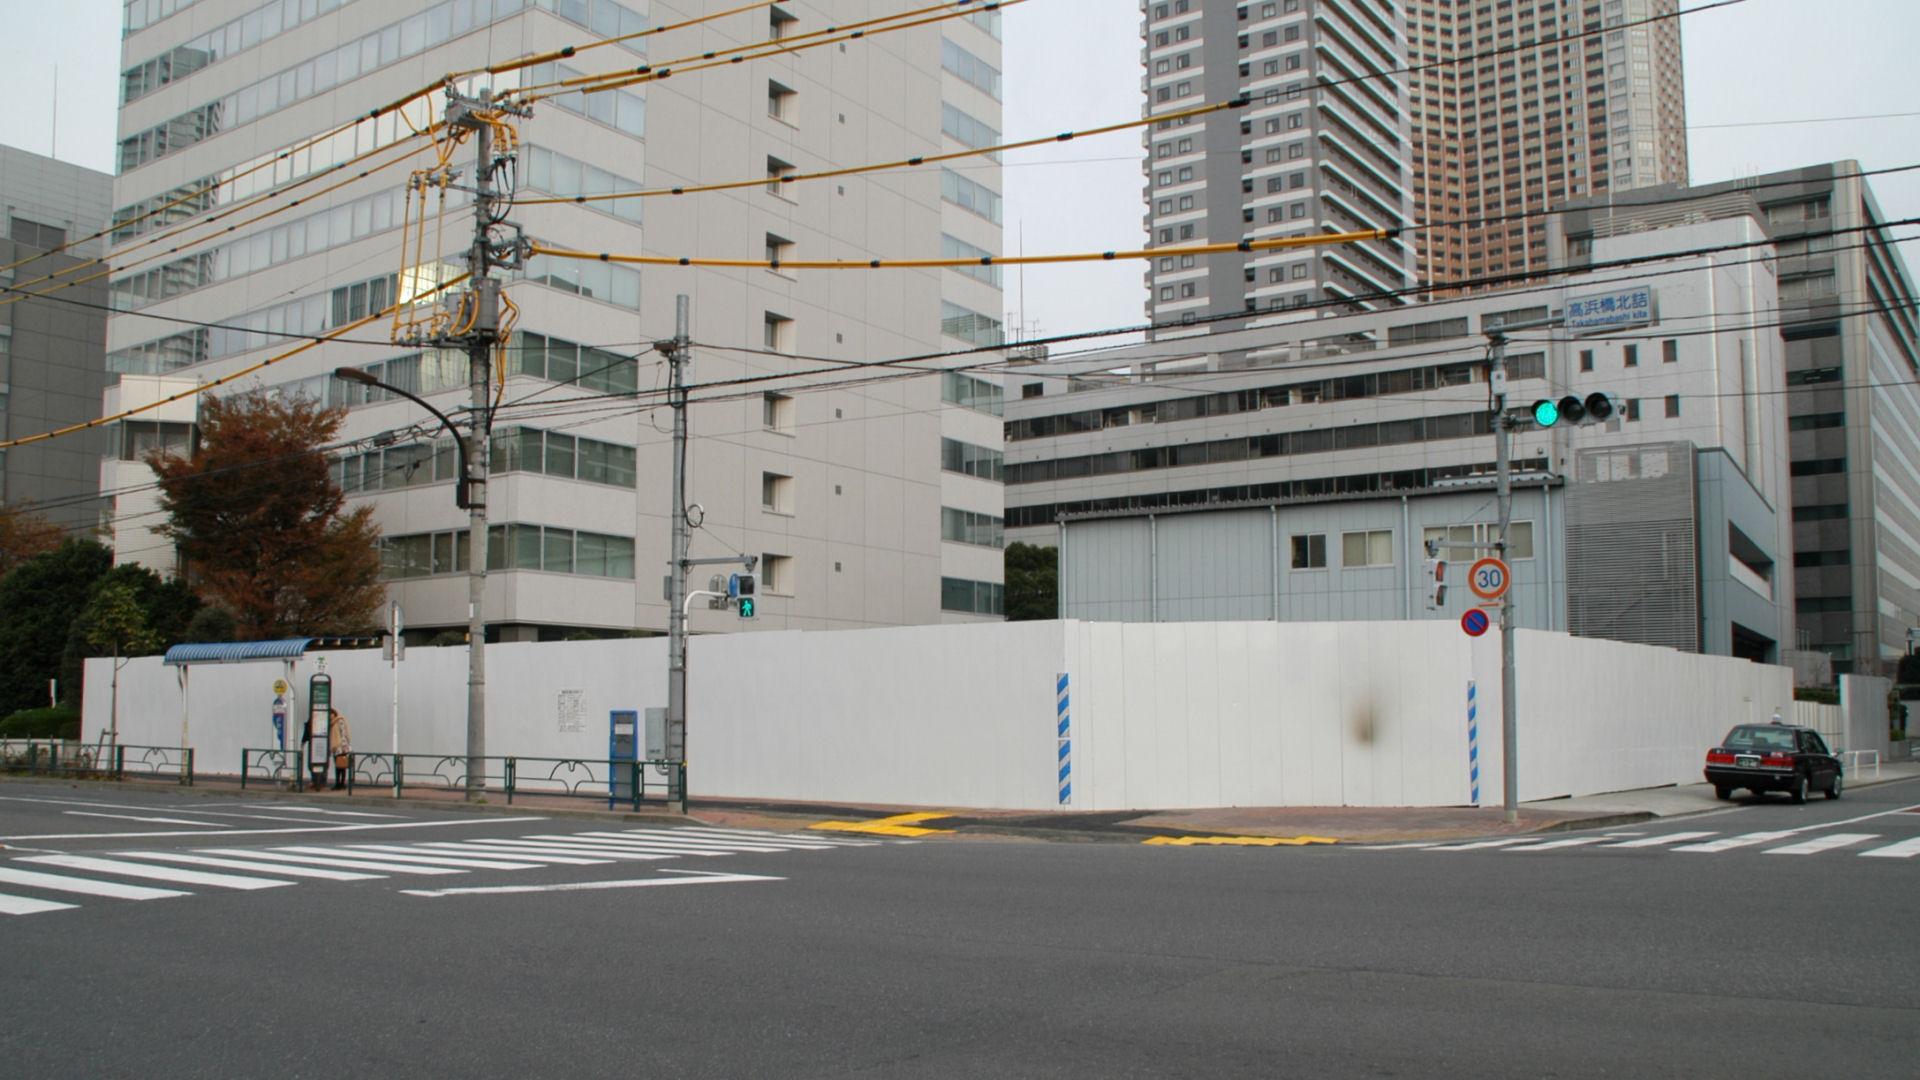 shibaura0098e.jpg